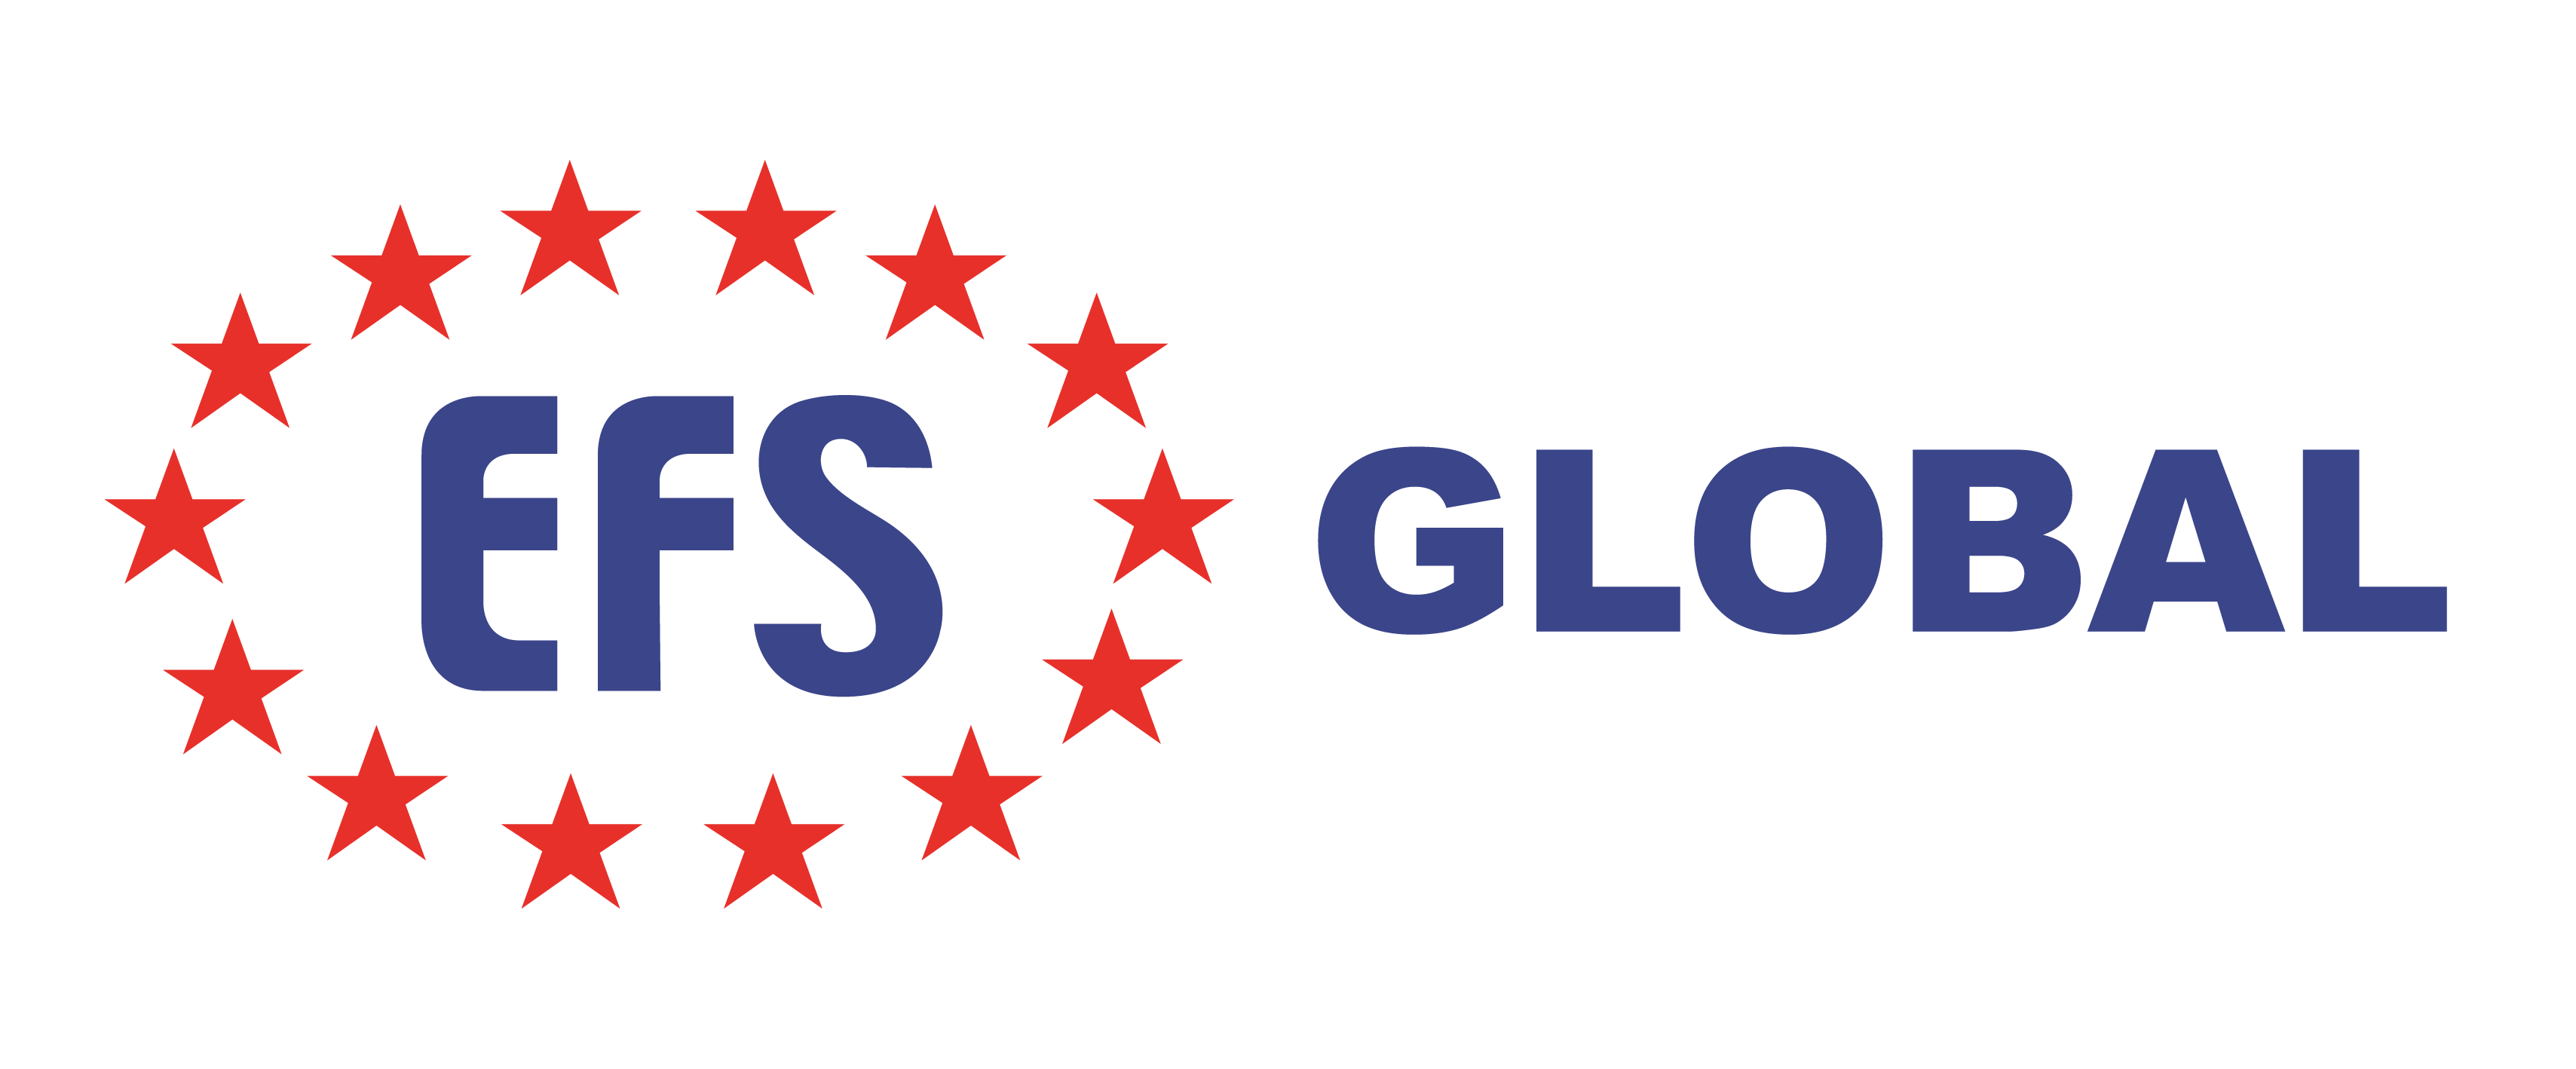 EFS Global